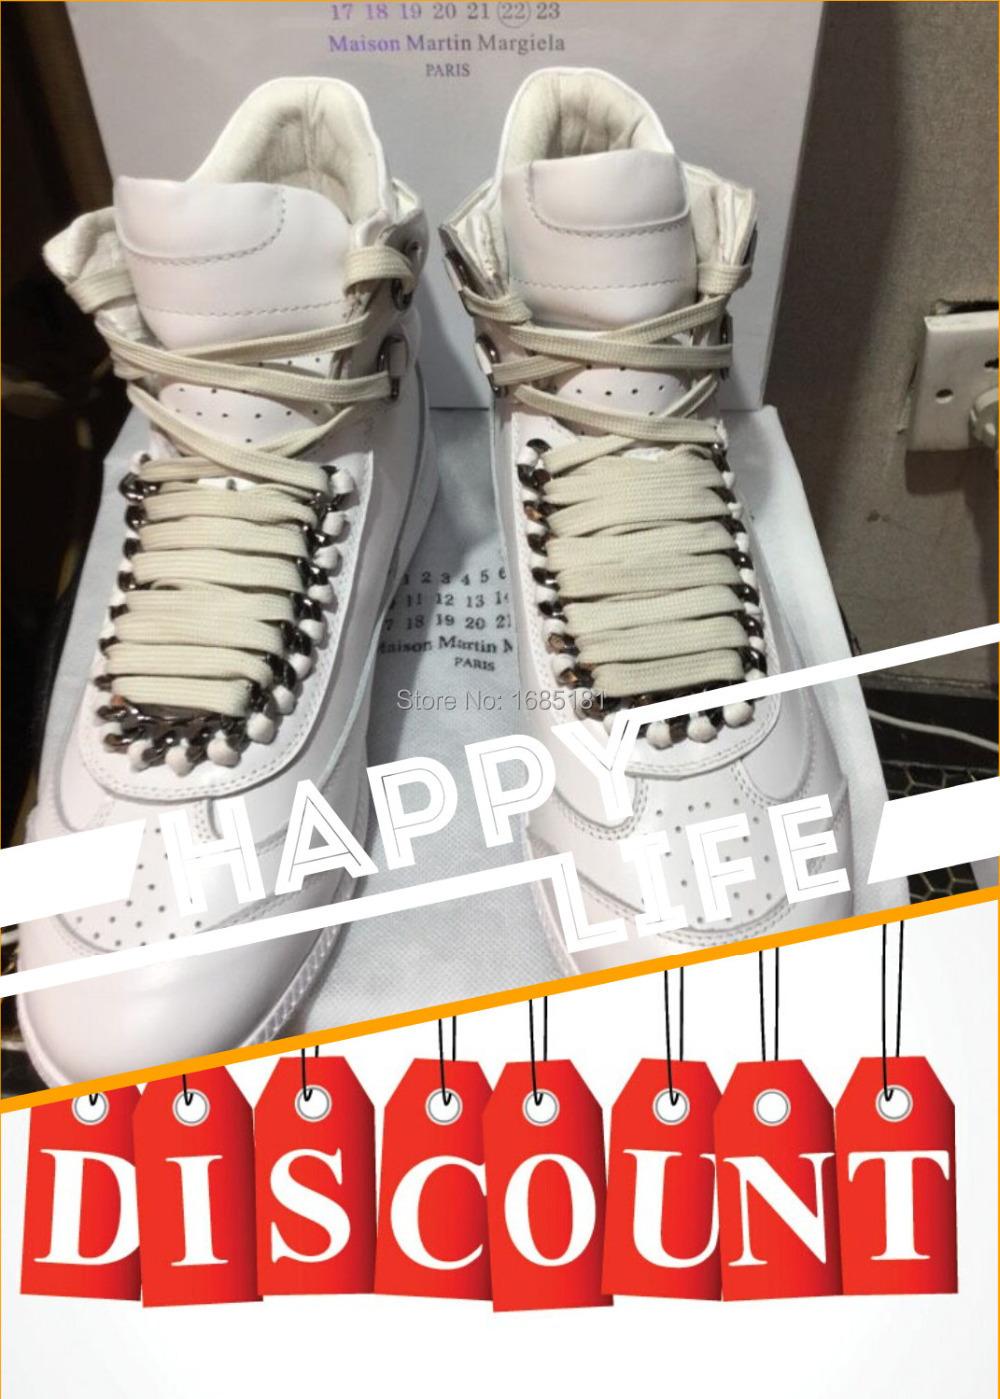 2016 New maison martin margiela casual shoes lace-up White genuine Leather Fashion Men's Shoes eu 39-45 - direct sale store